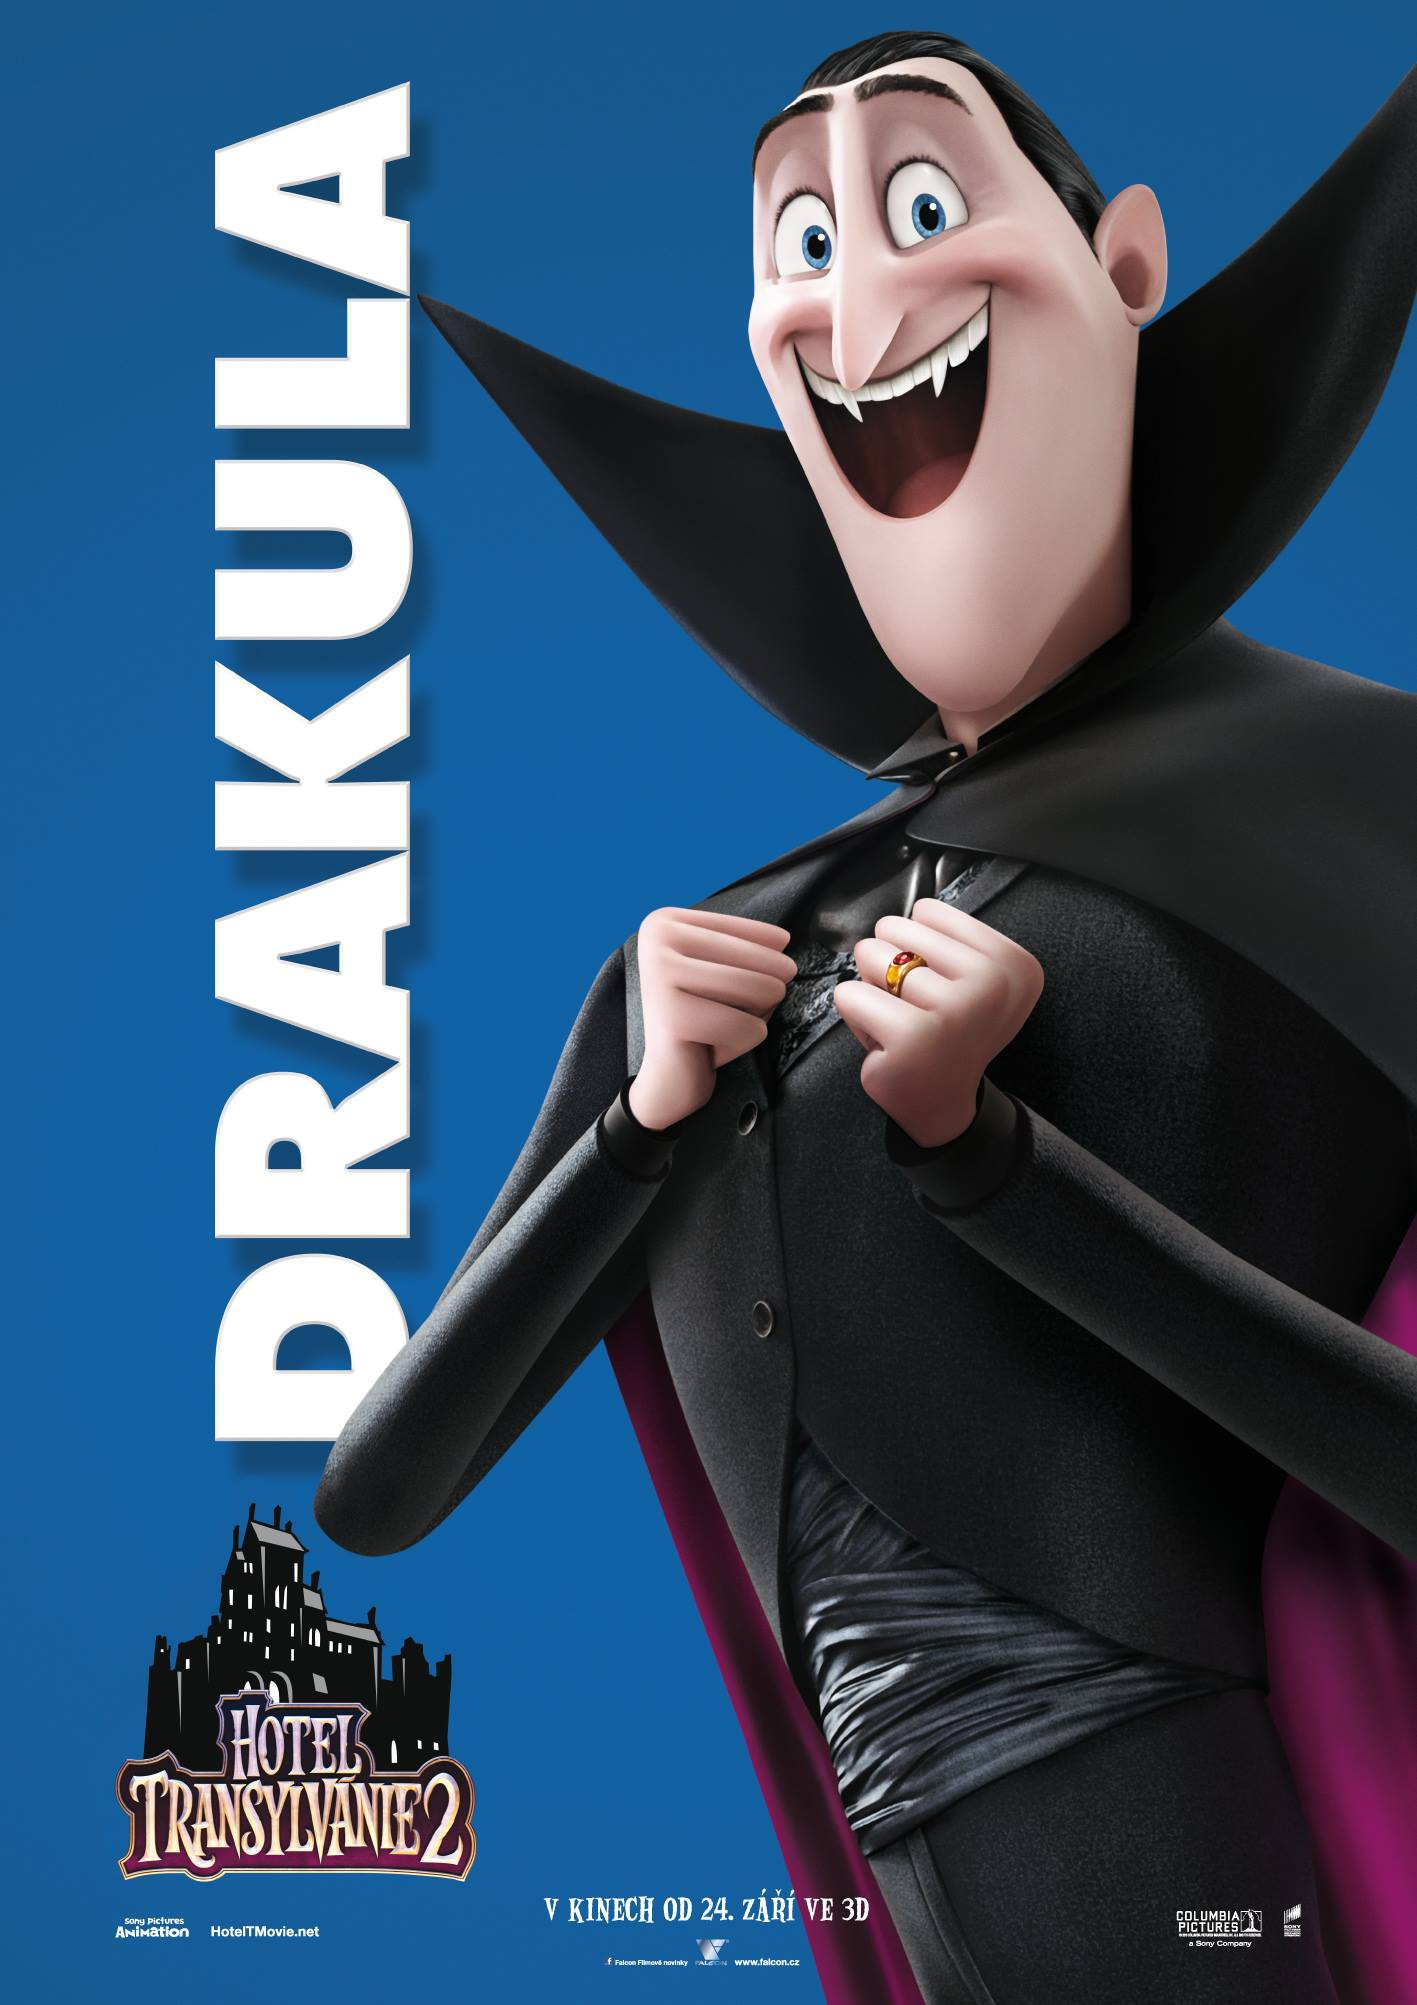 Disney Cartoon Characters Wallpapers In 3d Posters Individuales De Hotel Transylvania 2 Jposters